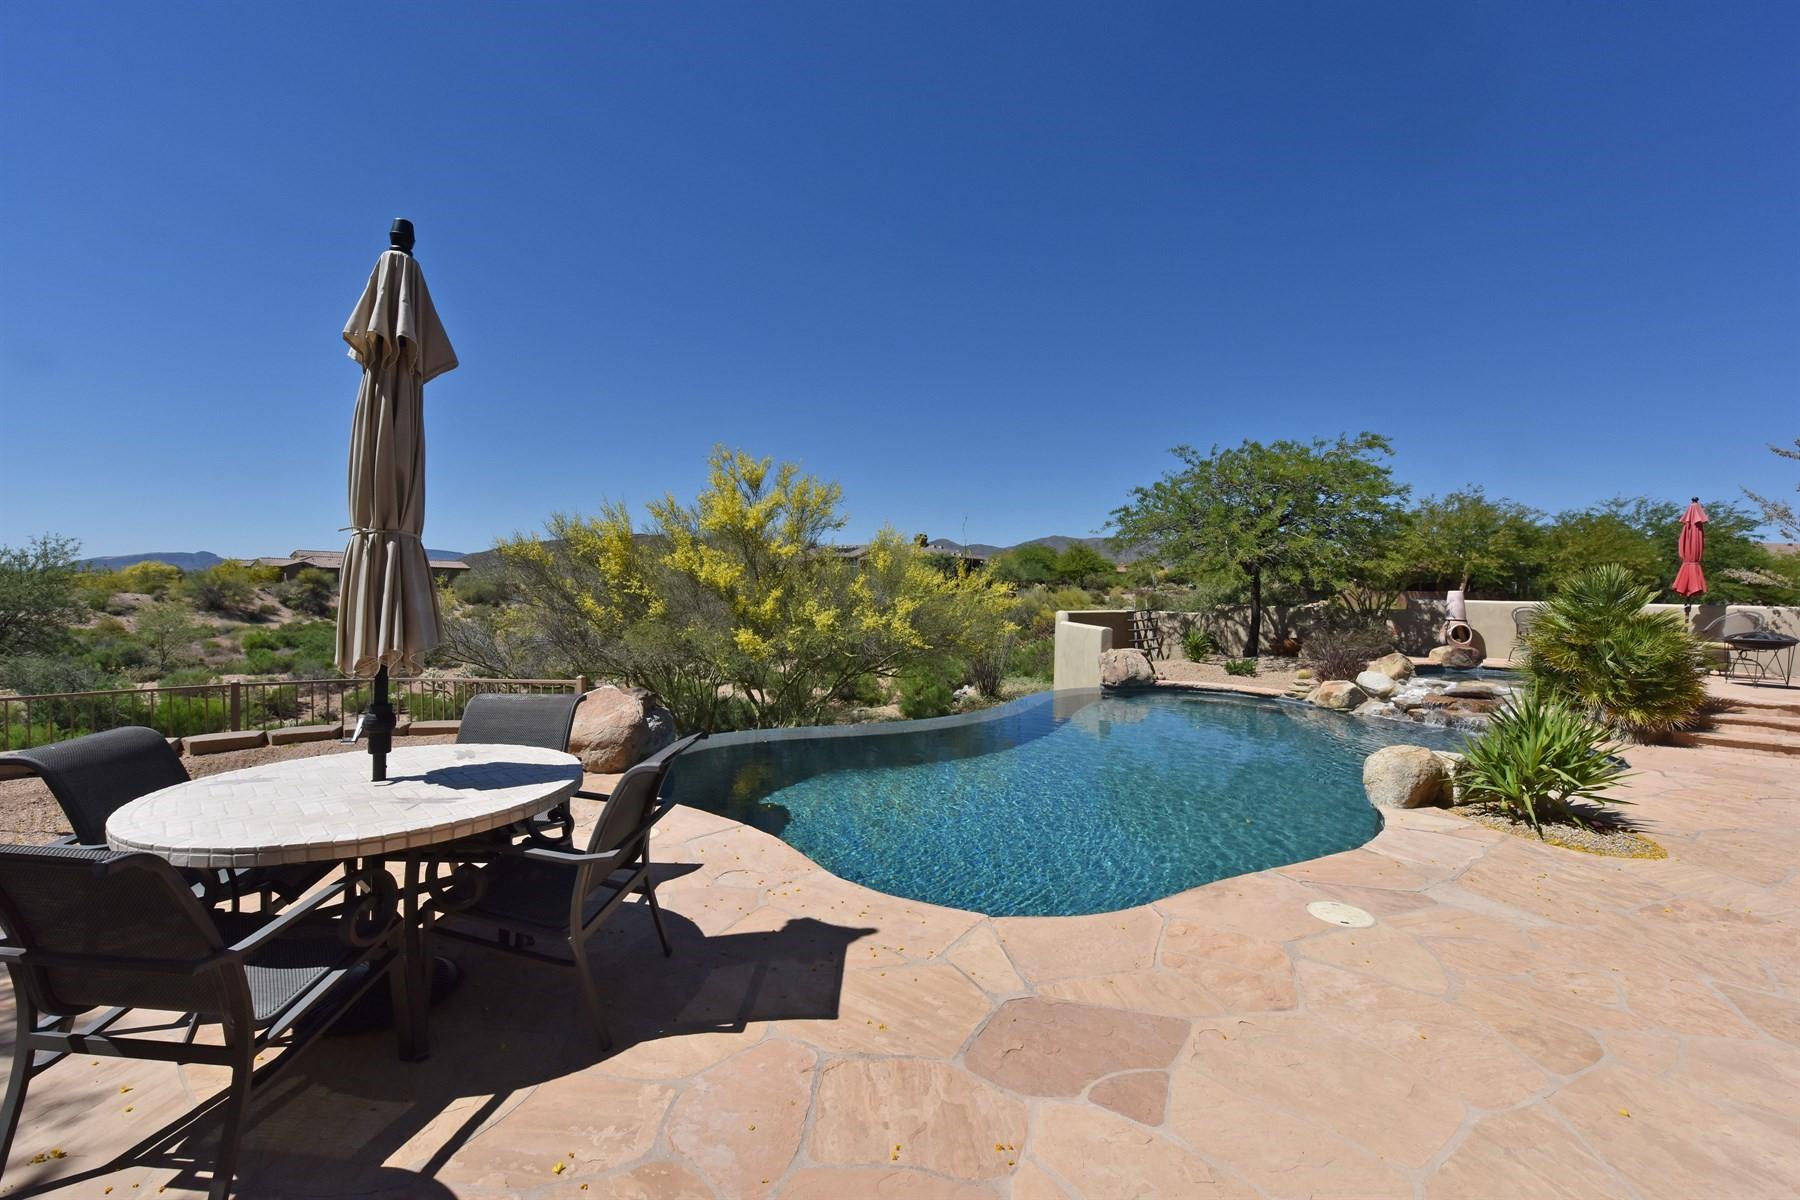 Single Family Home for Sale at Private retreat home in the gated community of Cresta Norte 10130 E Winter Sun Drive Scottsdale, Arizona, 85262 United States